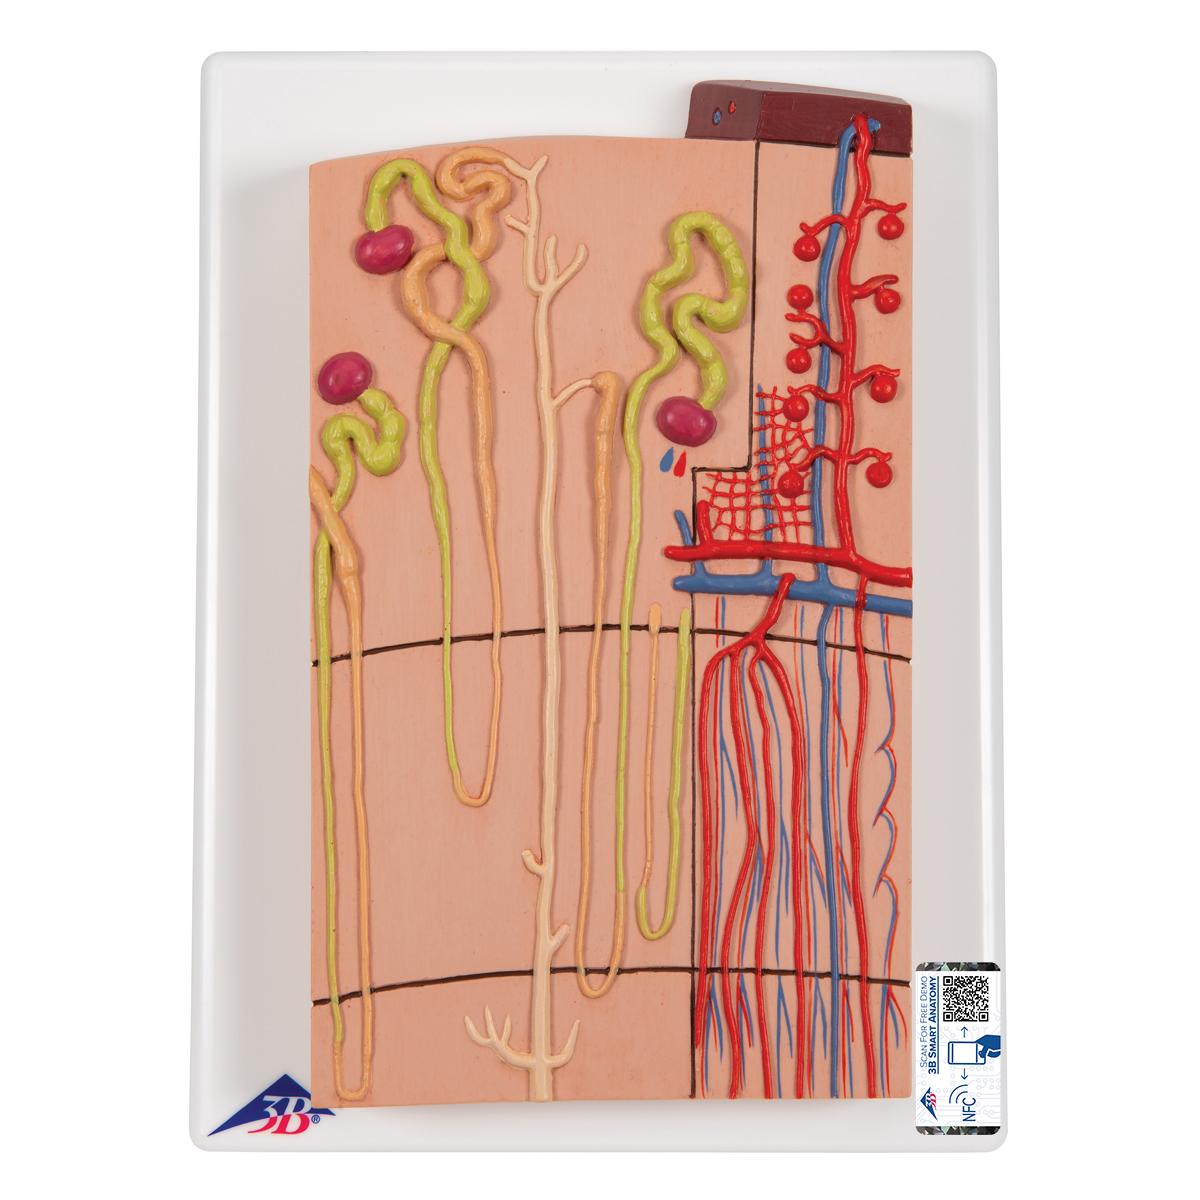 Anatomical Teaching Model - Plastic Anatomy Models - Renal System ...